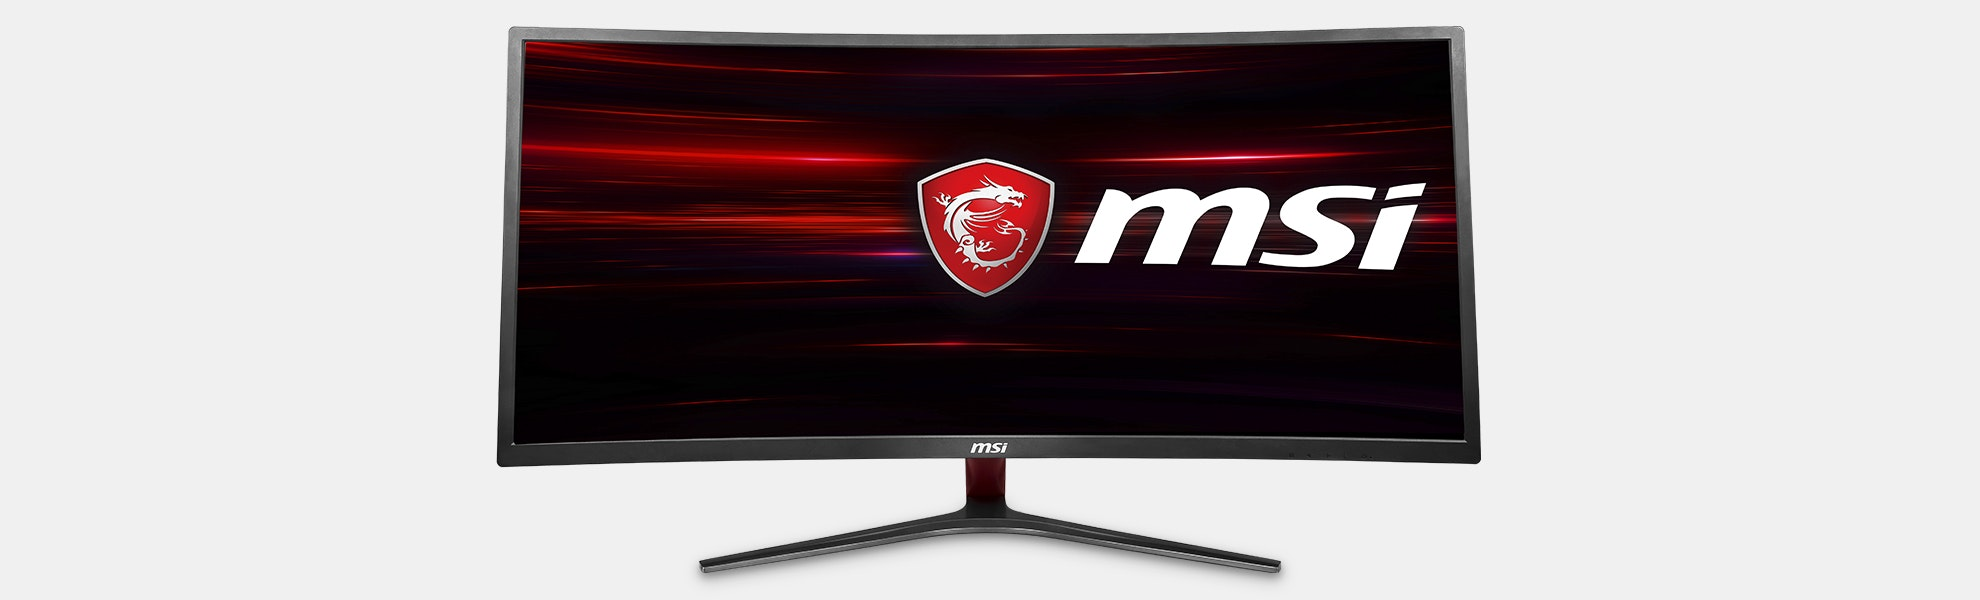 "MSI Optix 34"" 100Hz Curved Gaming Monitor"